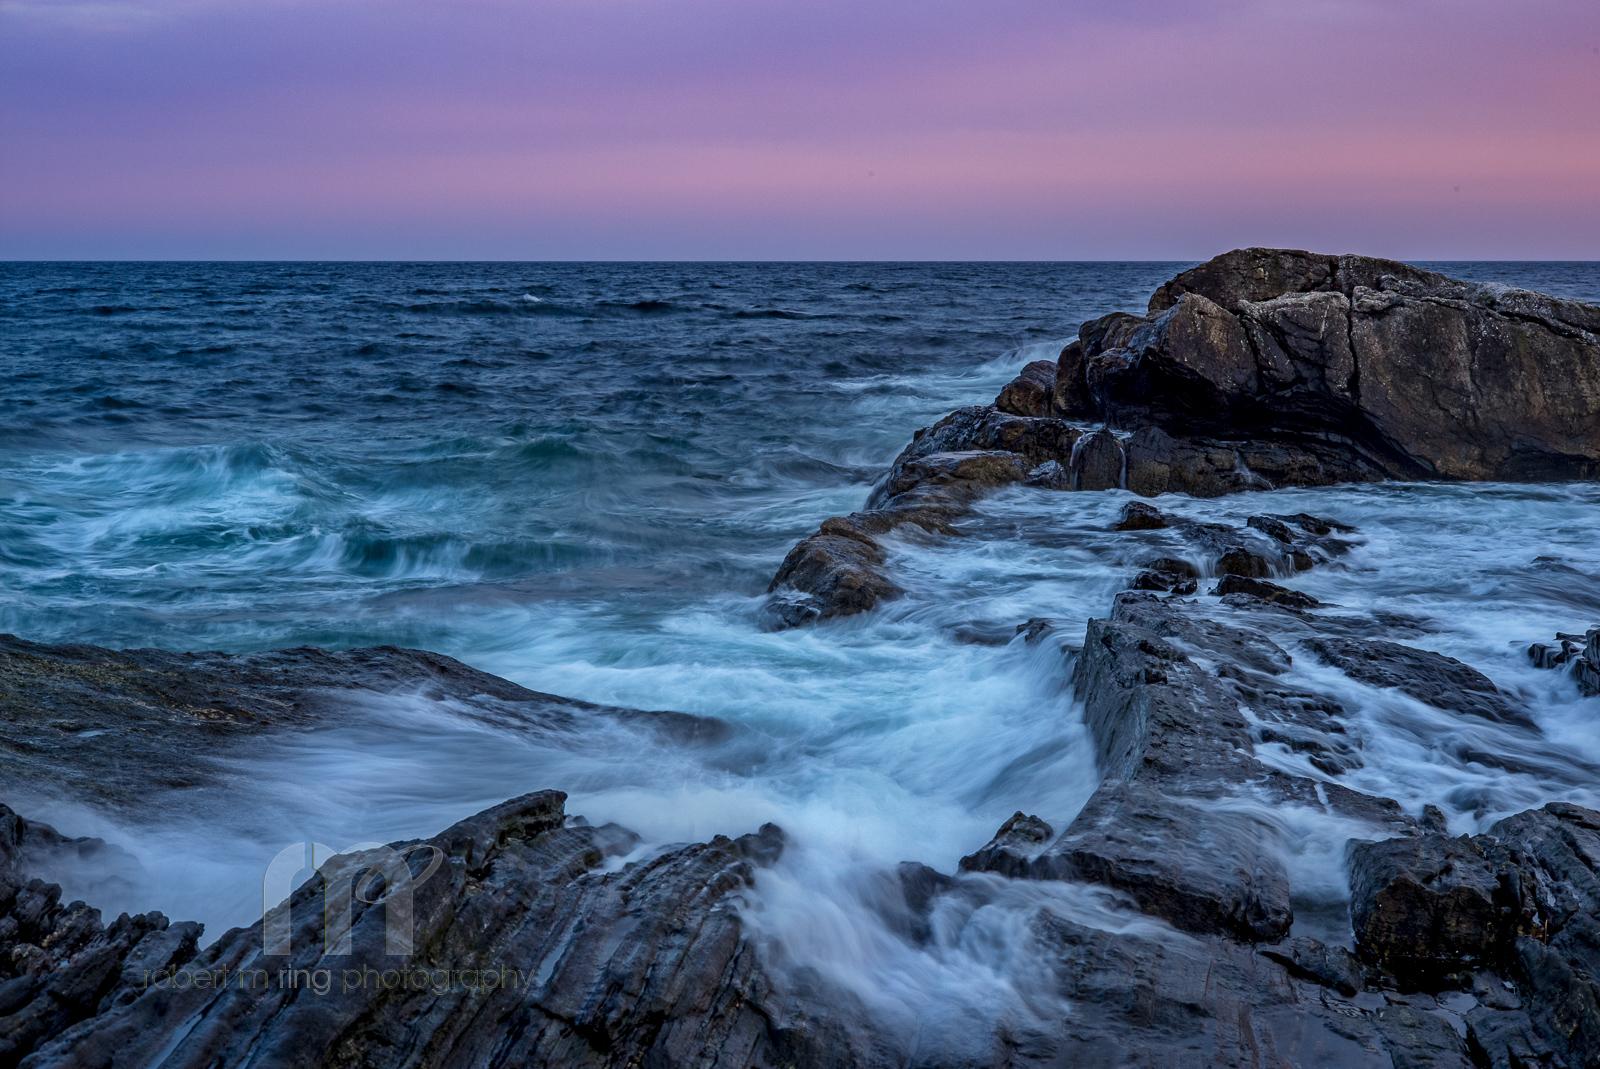 Maine, Lighthouse, coast, New England, ocean, wave, time exposure, sunset